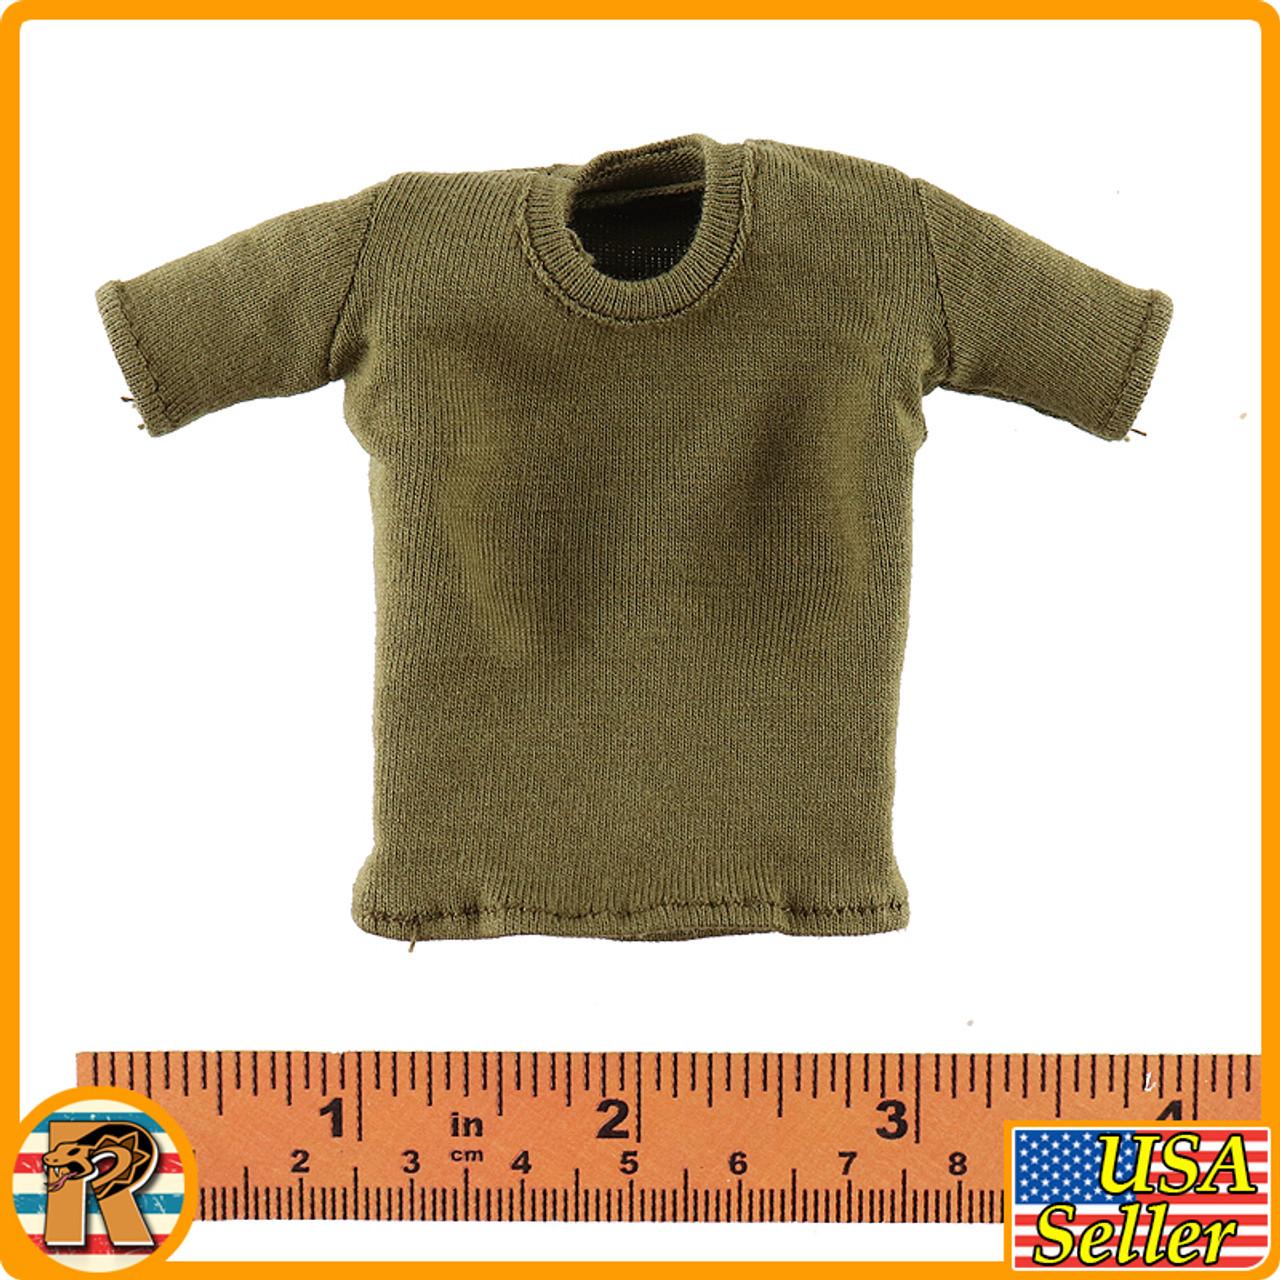 Miss Spetsnaz - T Shirt (Female) - 1/6 Scale -